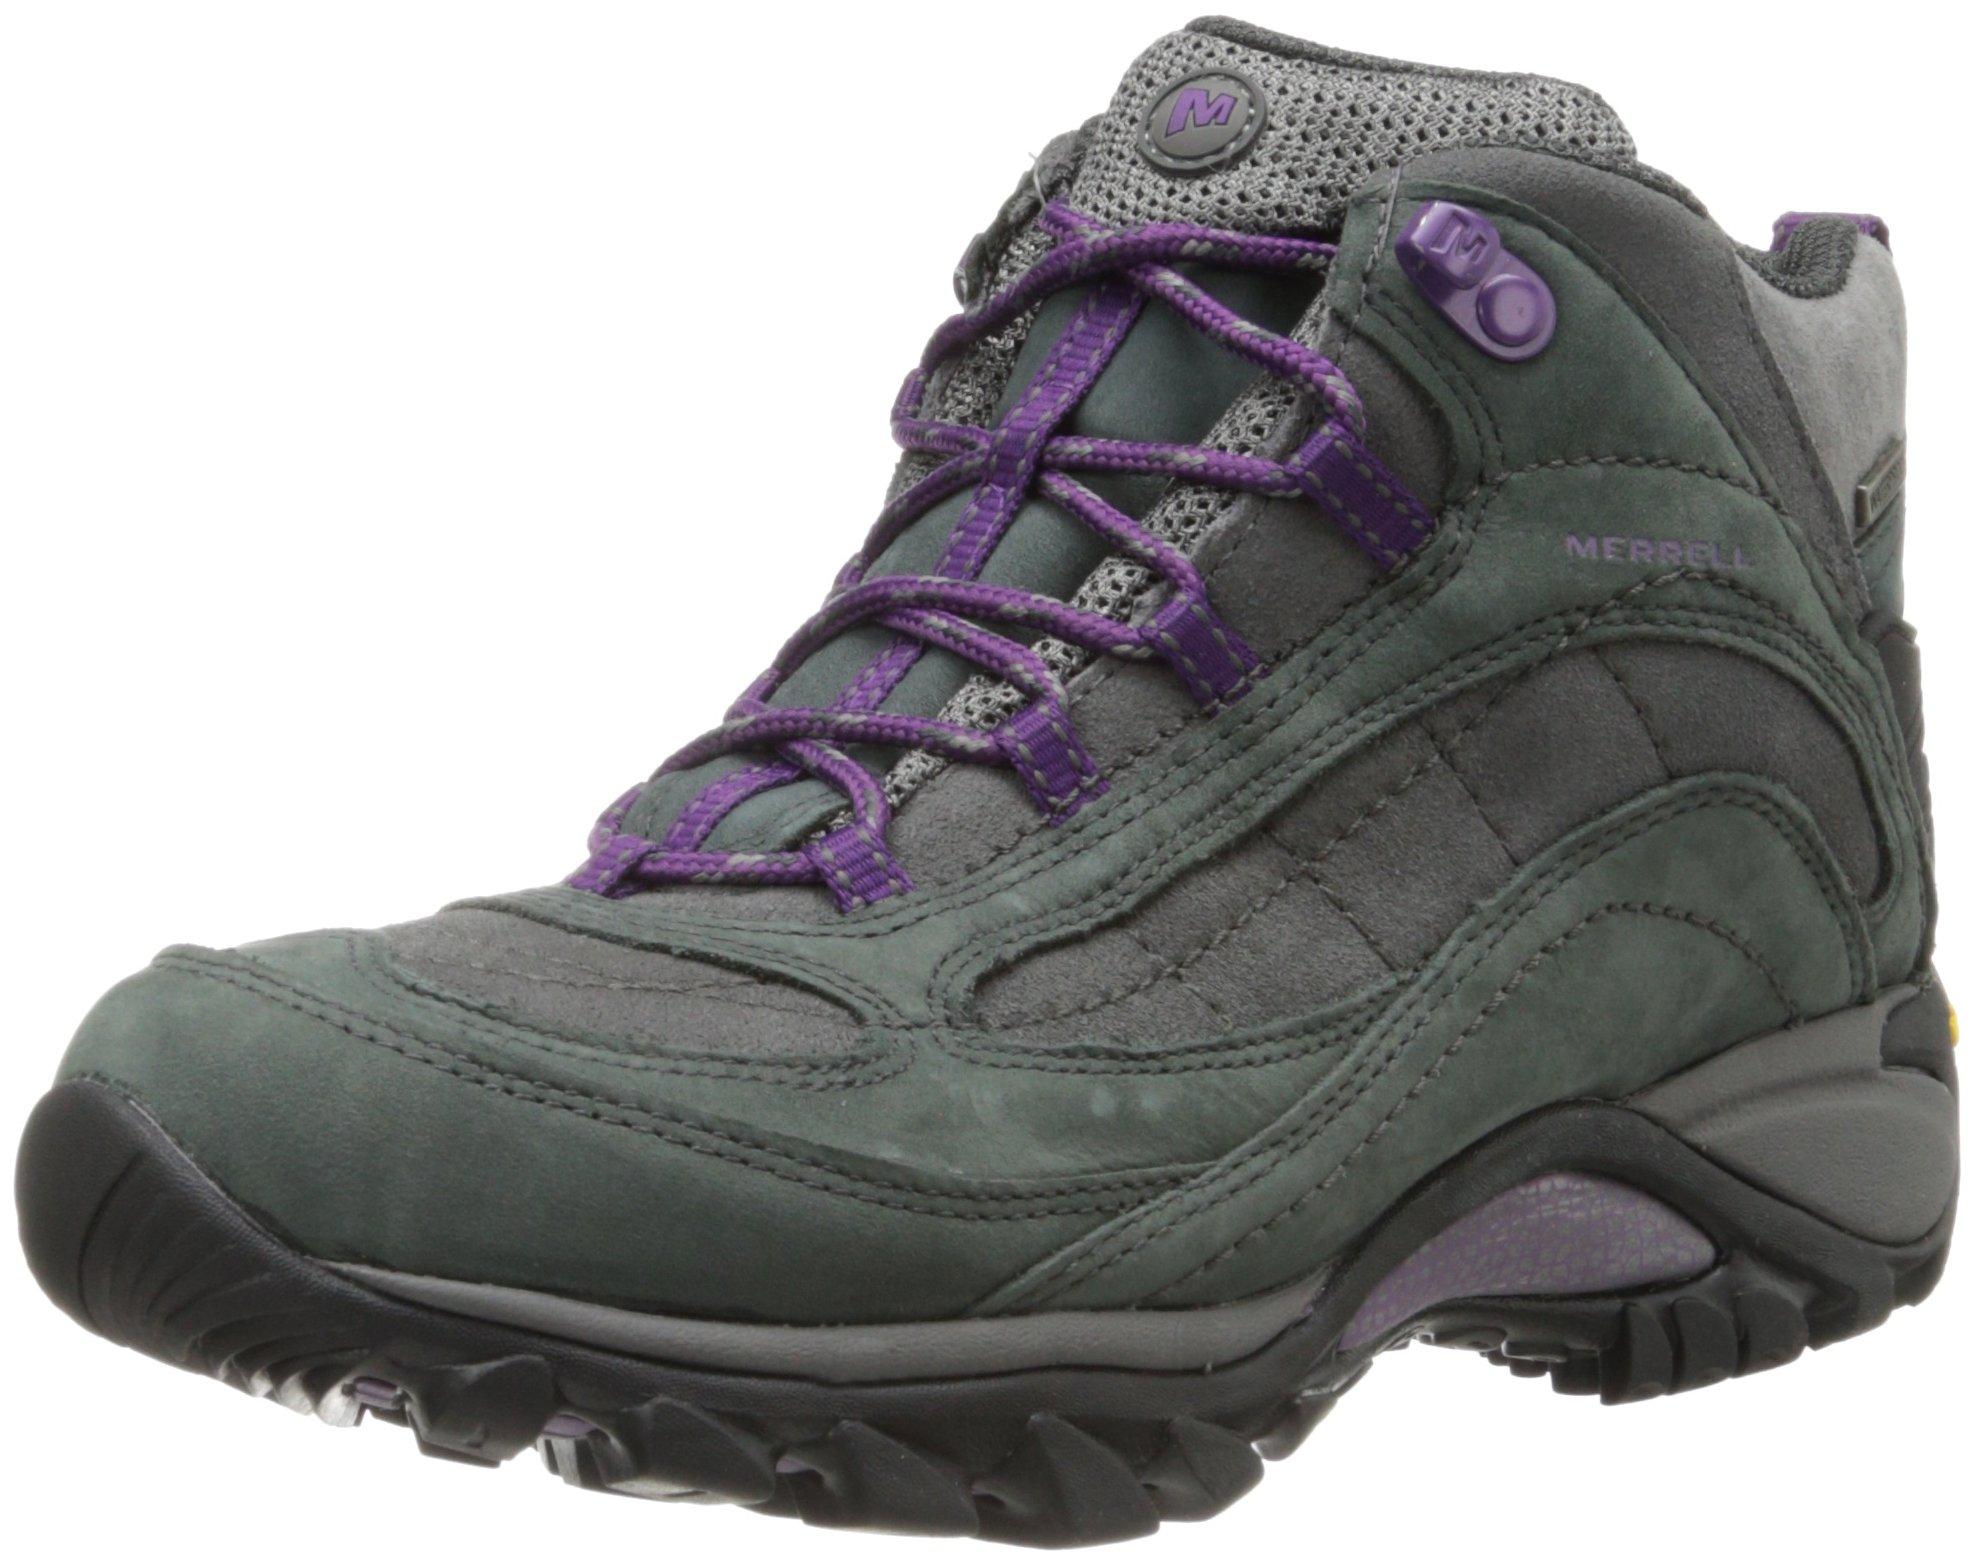 Merrell Women's Siren Waterproof Mid Hiking Boot,Granite/Purple,6 M US